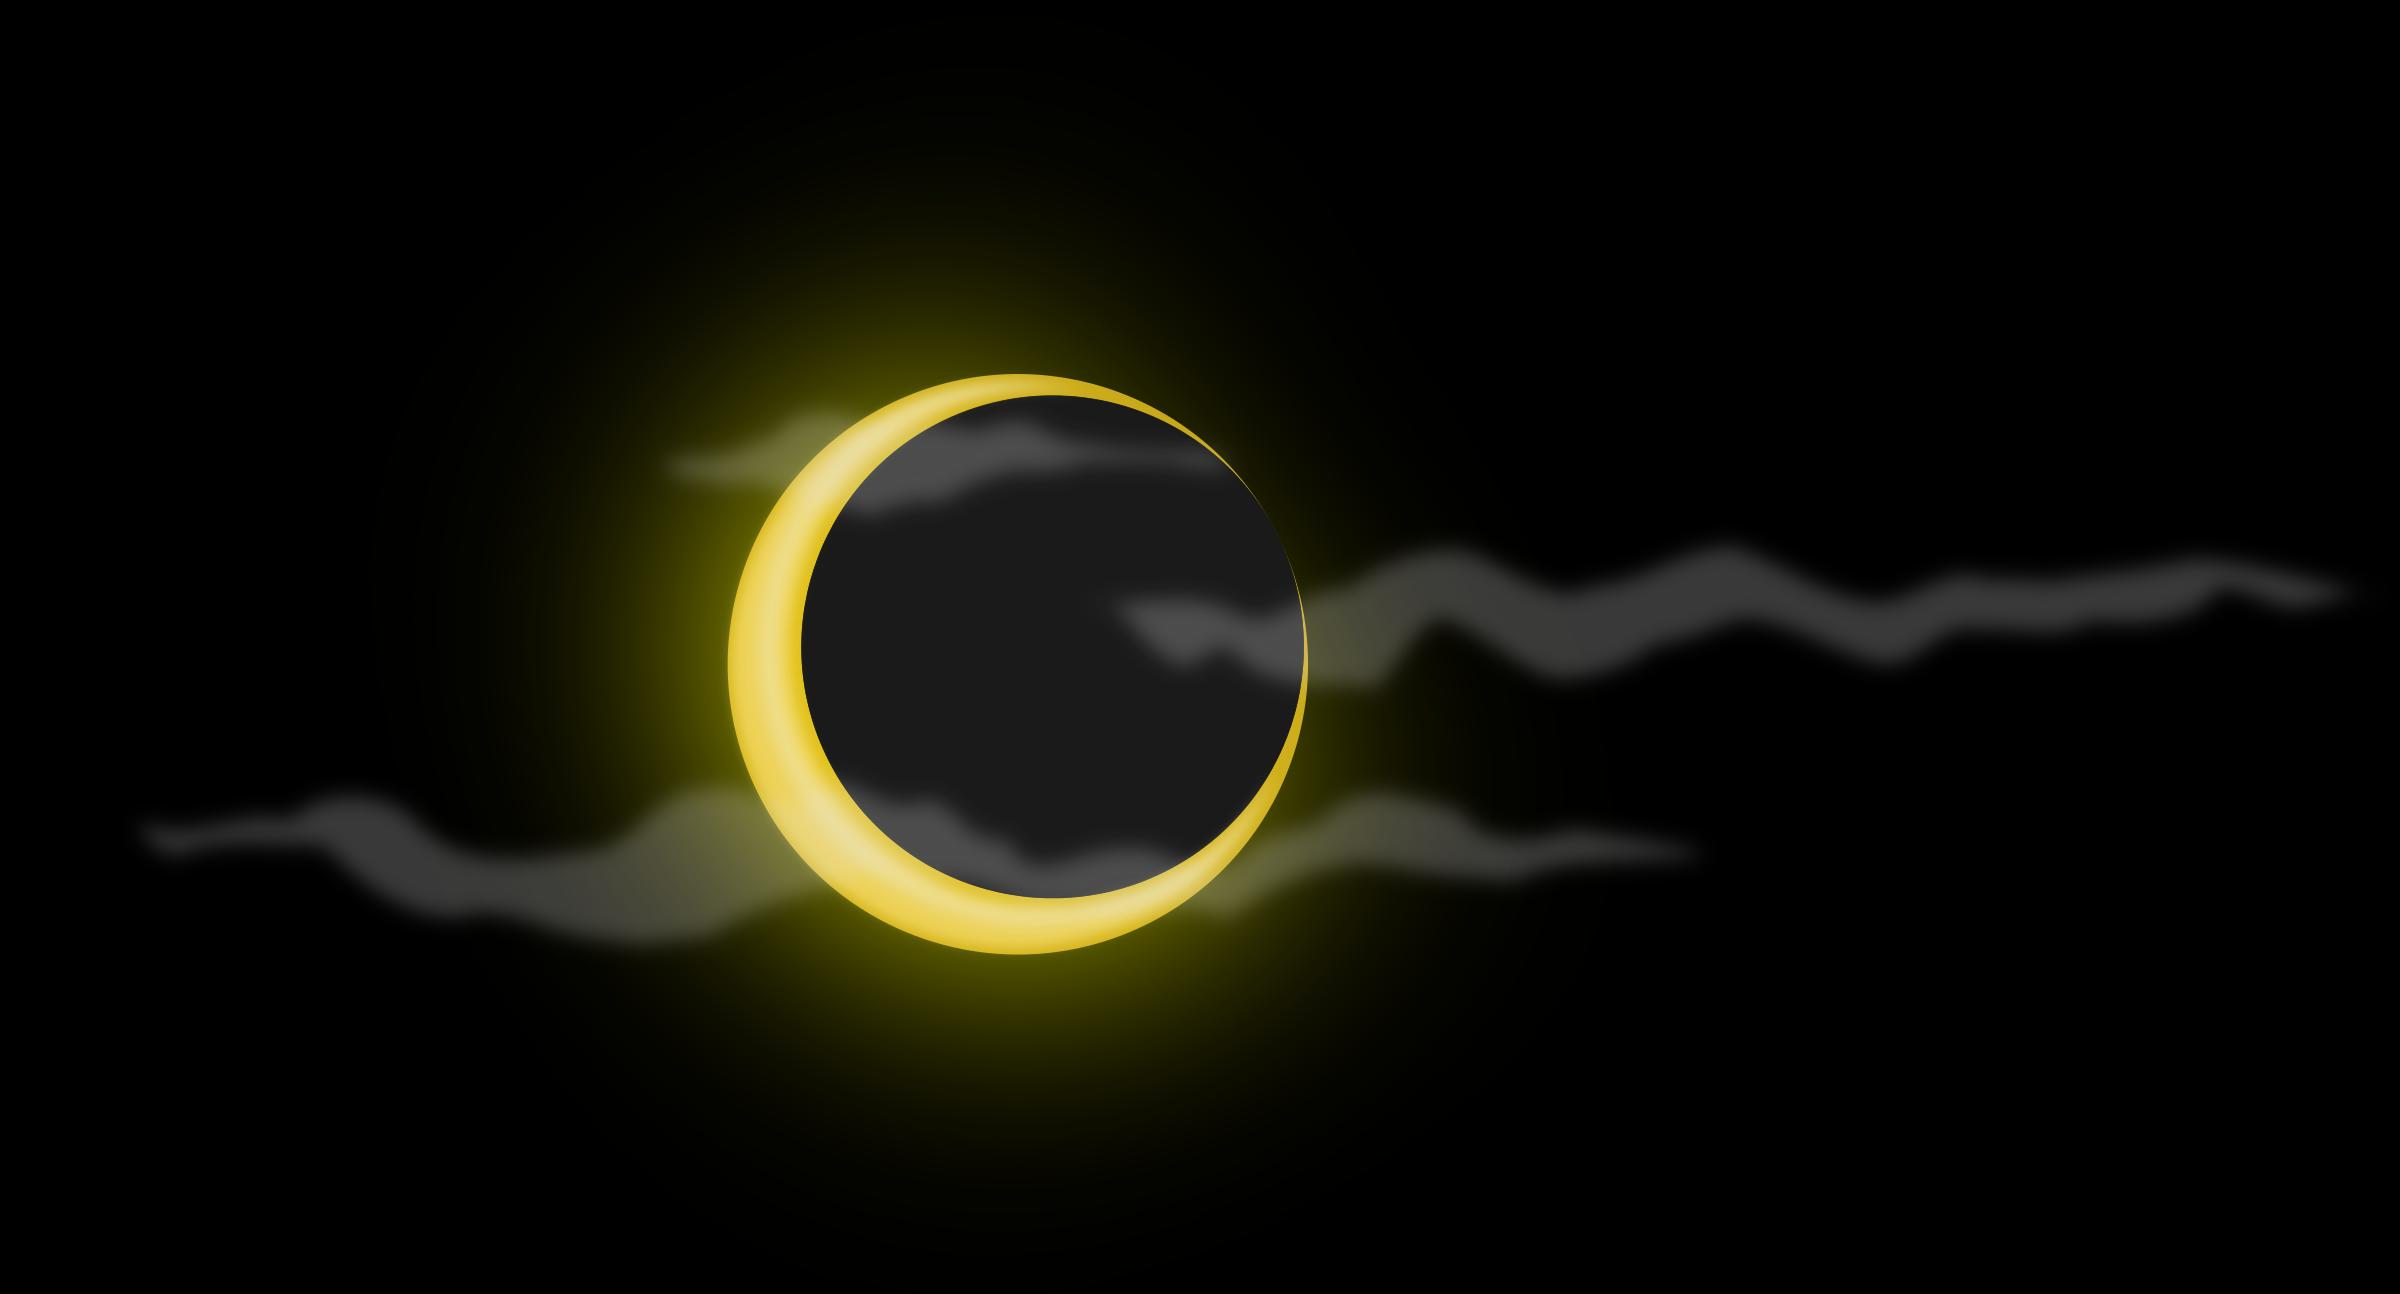 Moonlight clipart Moonlight Moonlight Clipart